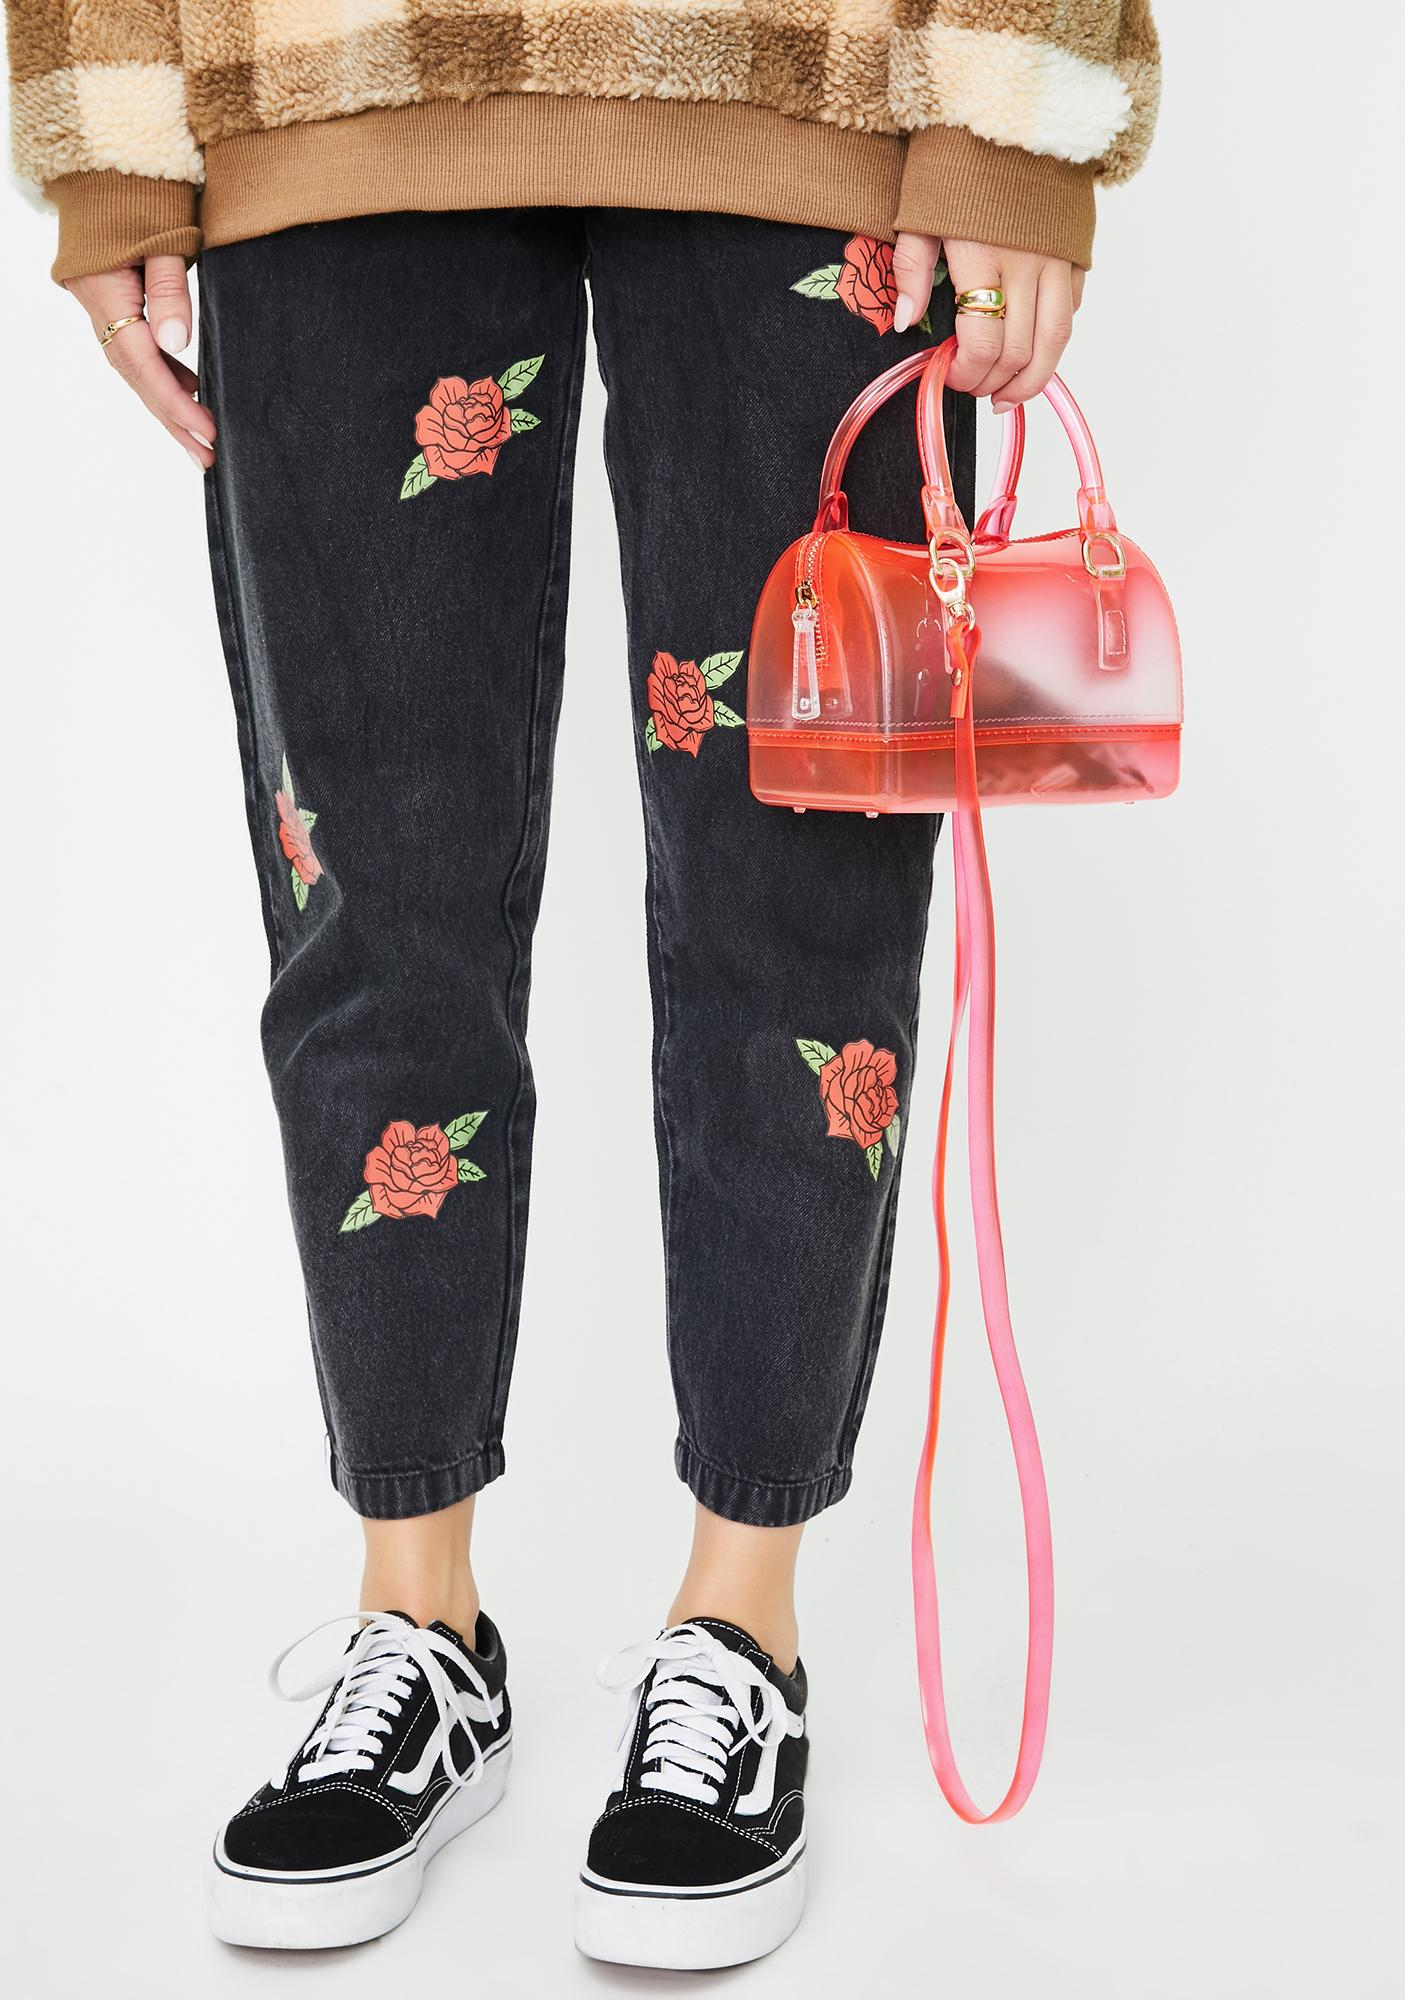 Rose Let 'em Look Transparent Handbag by Dolls Kill